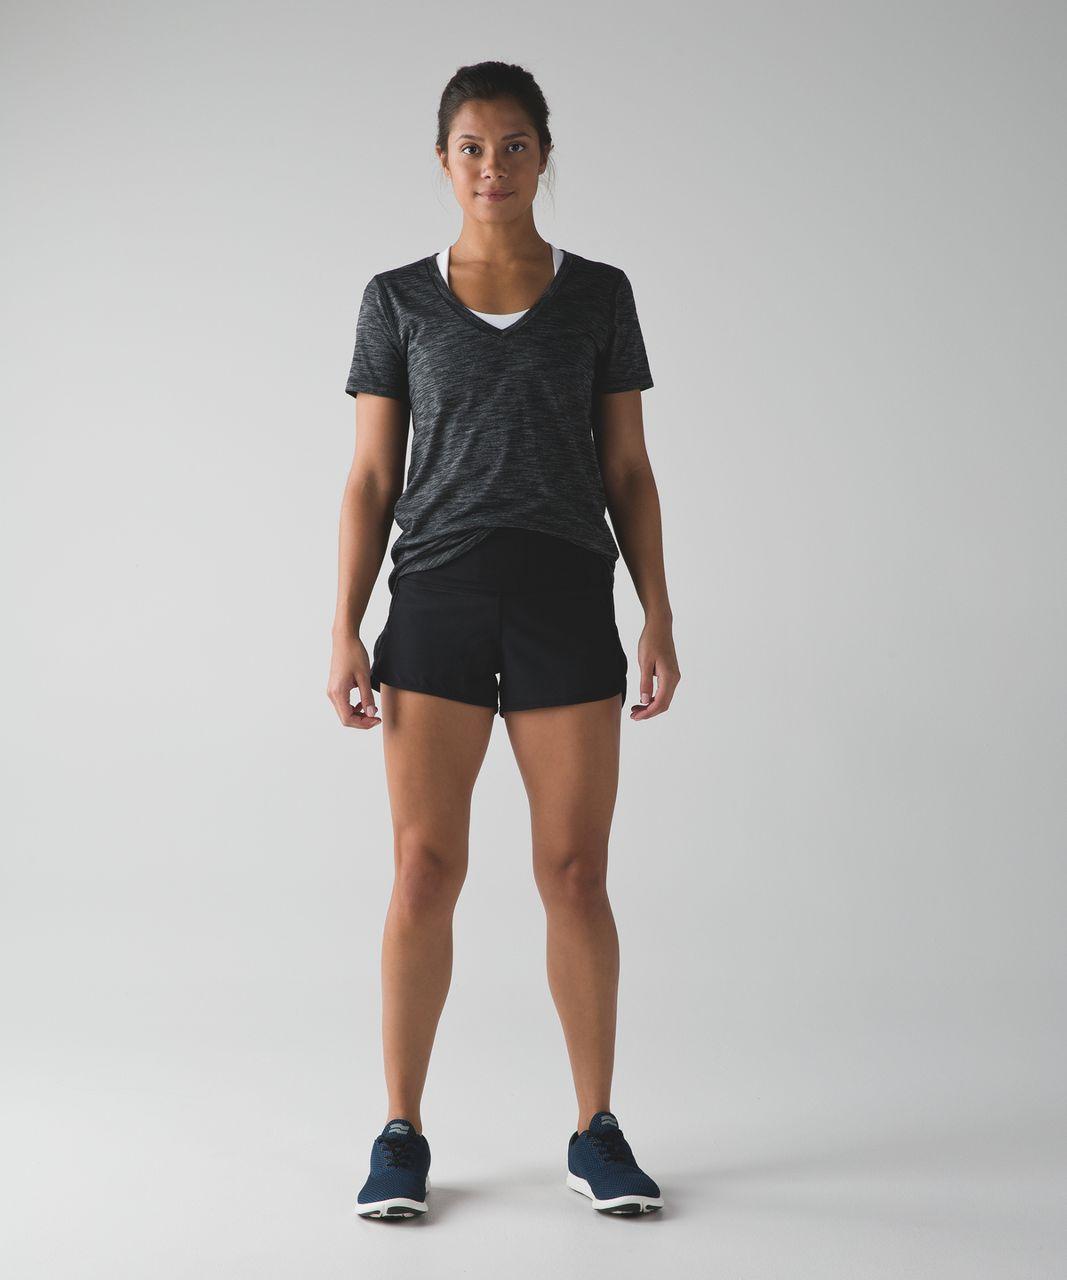 Lululemon Speed Short (High Waist) - Black